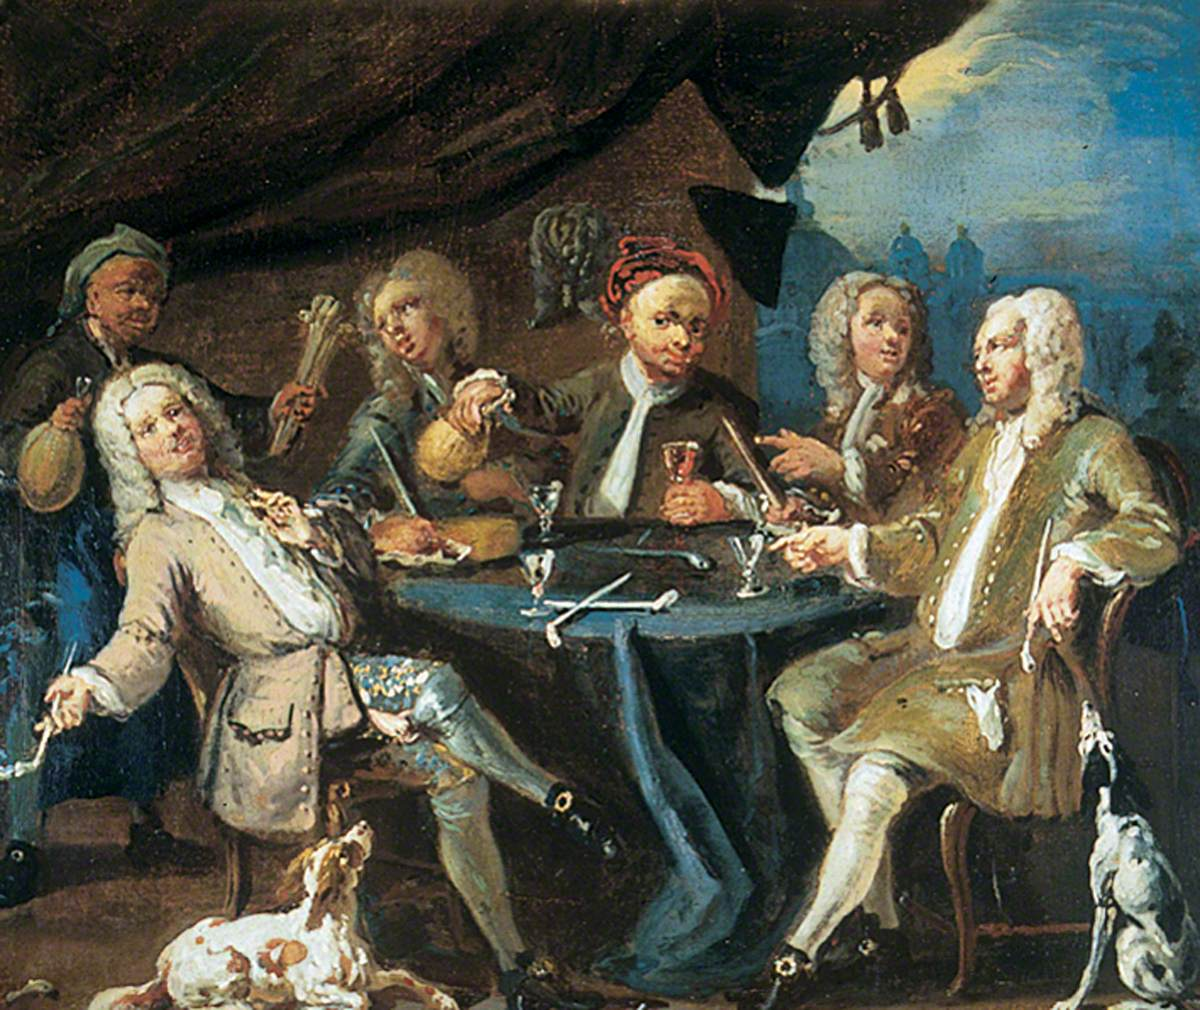 William Hogarth, The Kit Kat Klub